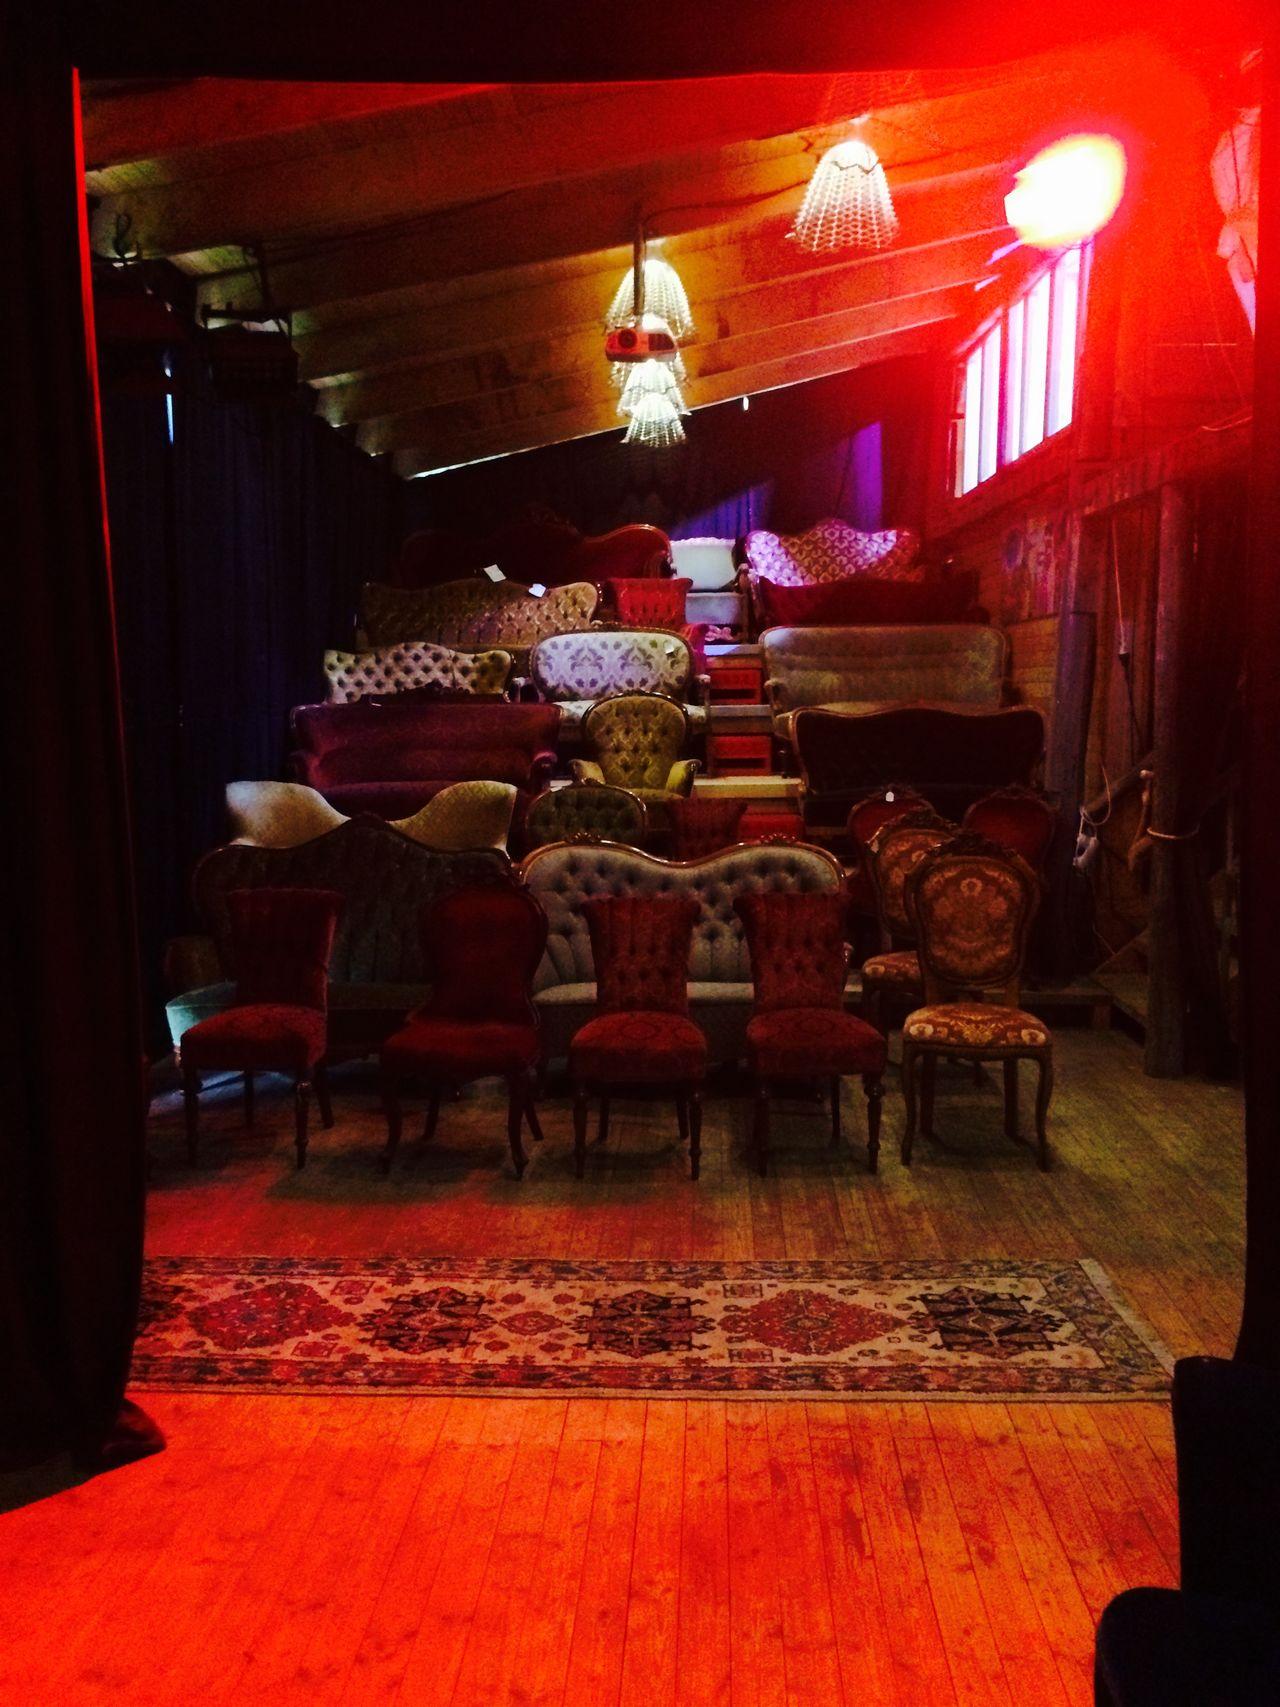 Cinema Chair MOVIE Interesting Pieces Having Fun Architecture Interior Strange Red Cosy Film DavidLynch